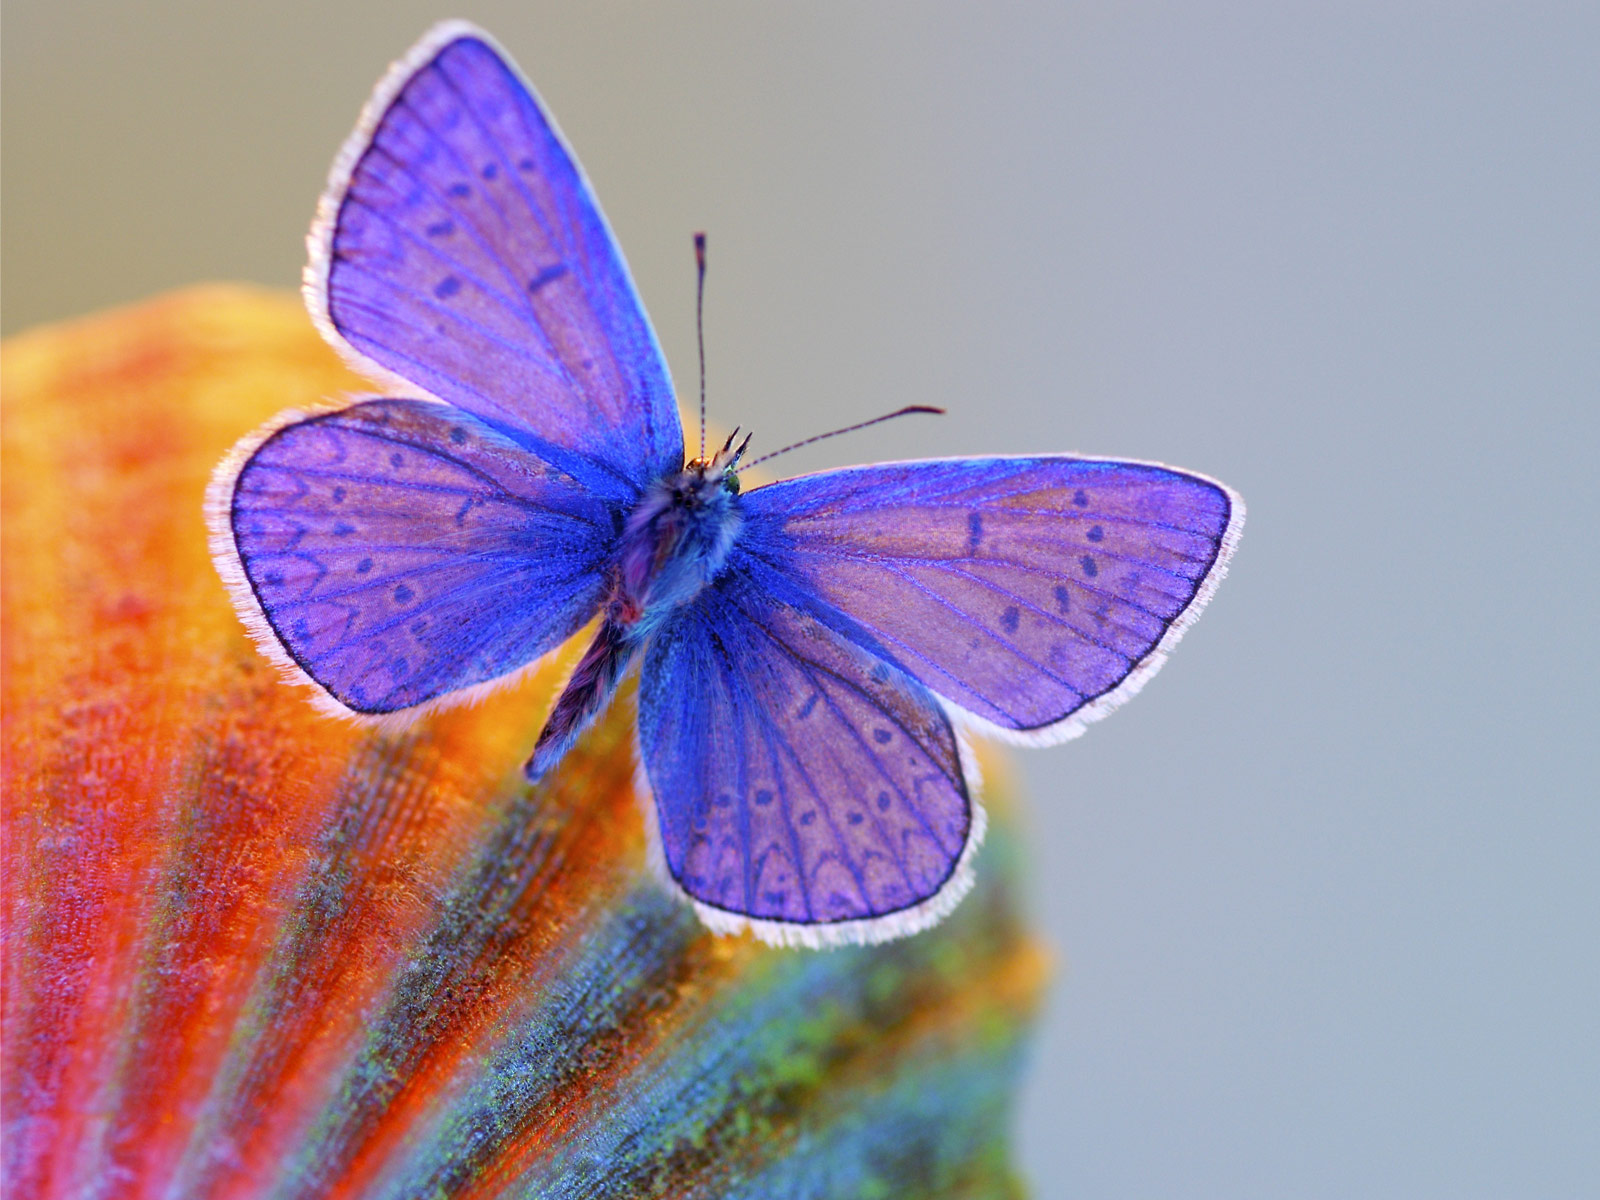 Butterfly Wallpaper HD 1600x1200 ImageBankbiz 1600x1200